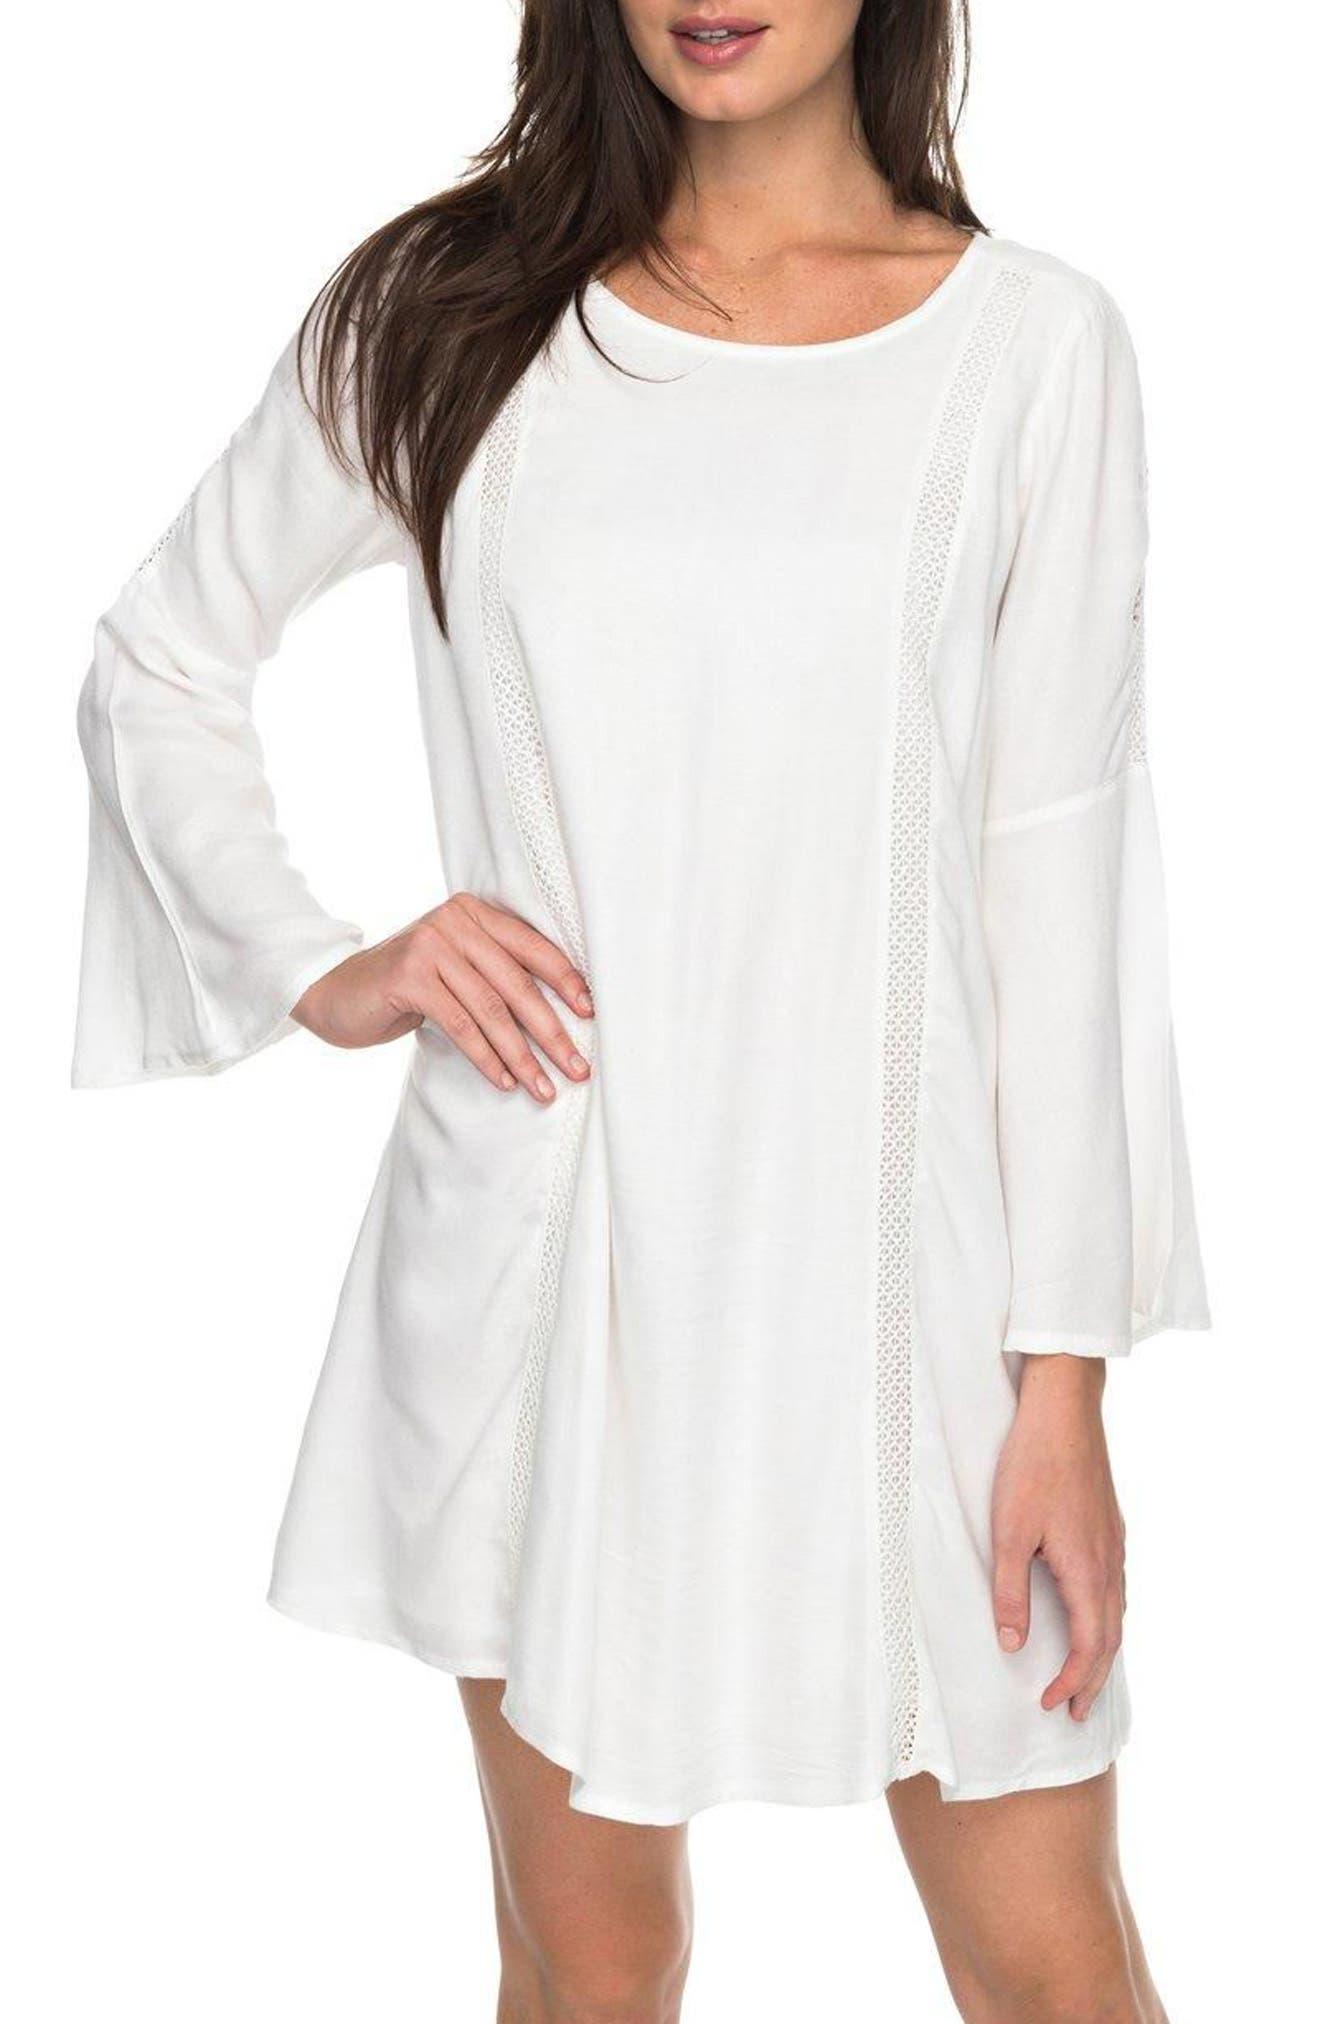 Alternate Image 1 Selected - Roxy East Coast Dreamer Dress